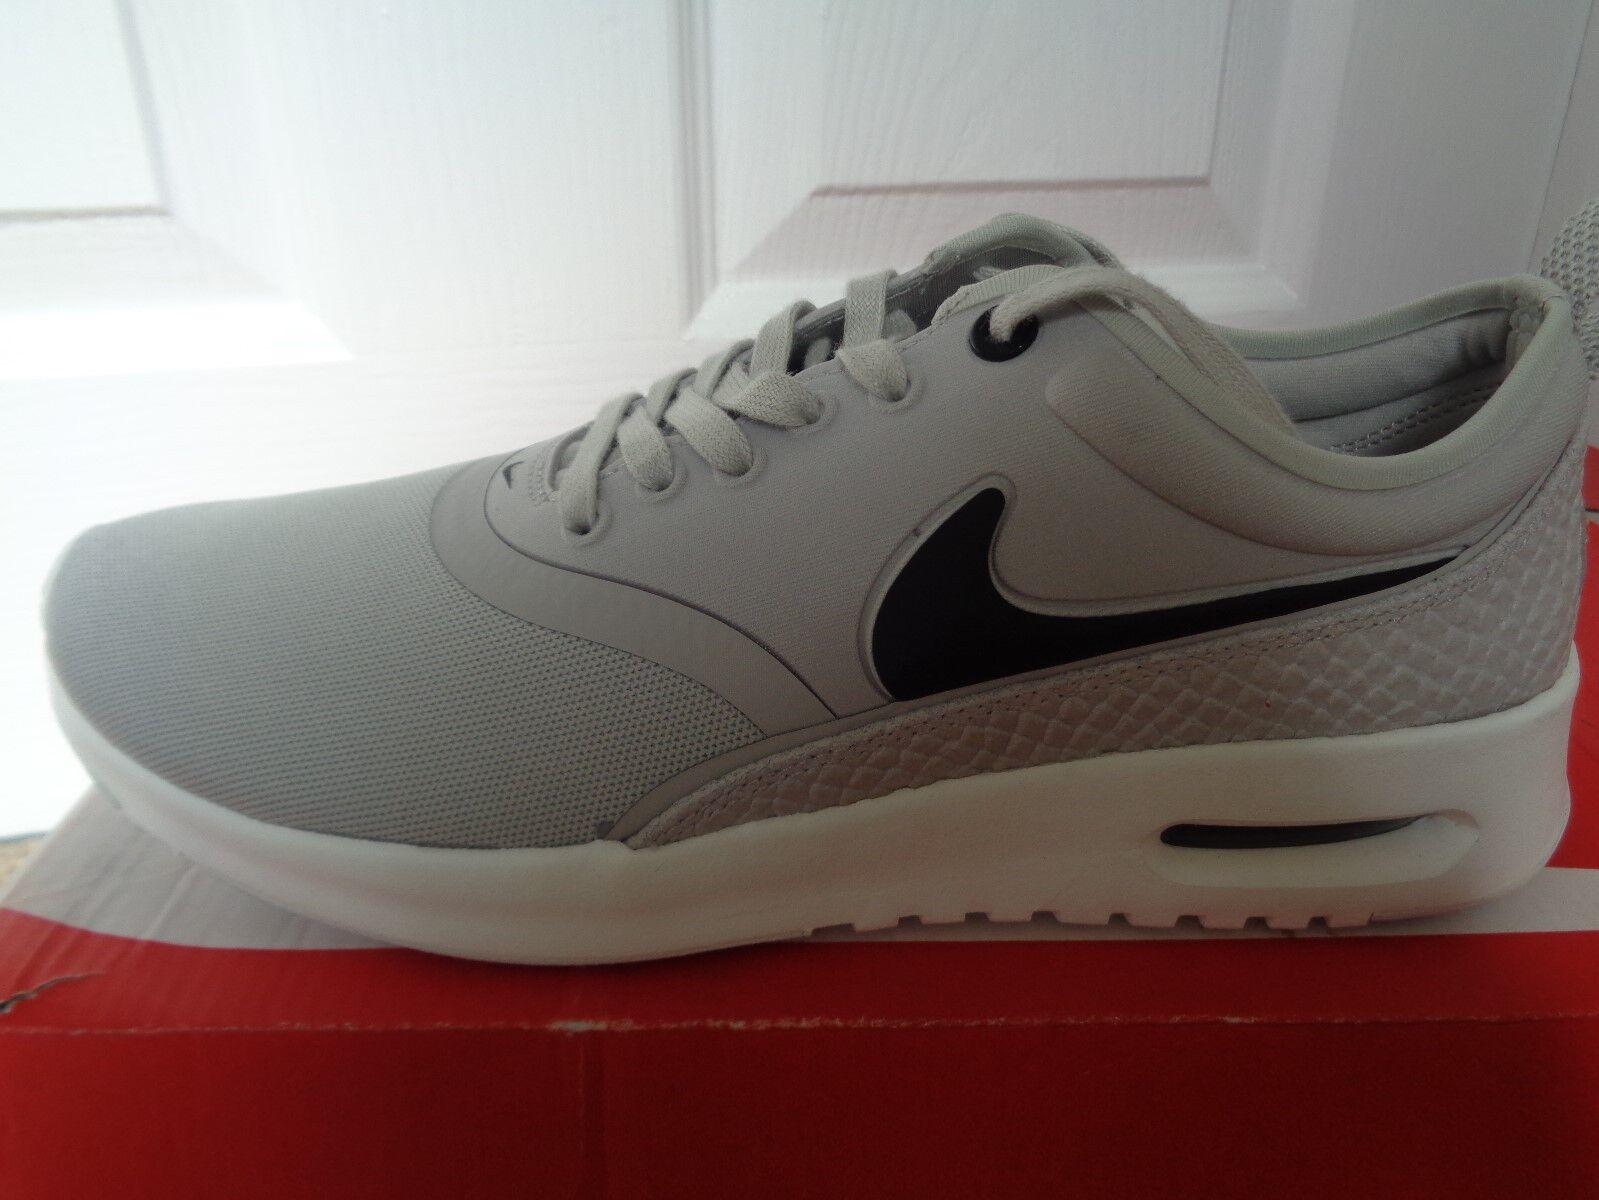 Nike Air Max Thea Ultra Zapatillas Sneakers 848279 002 nos 8 Nuevo + Caja